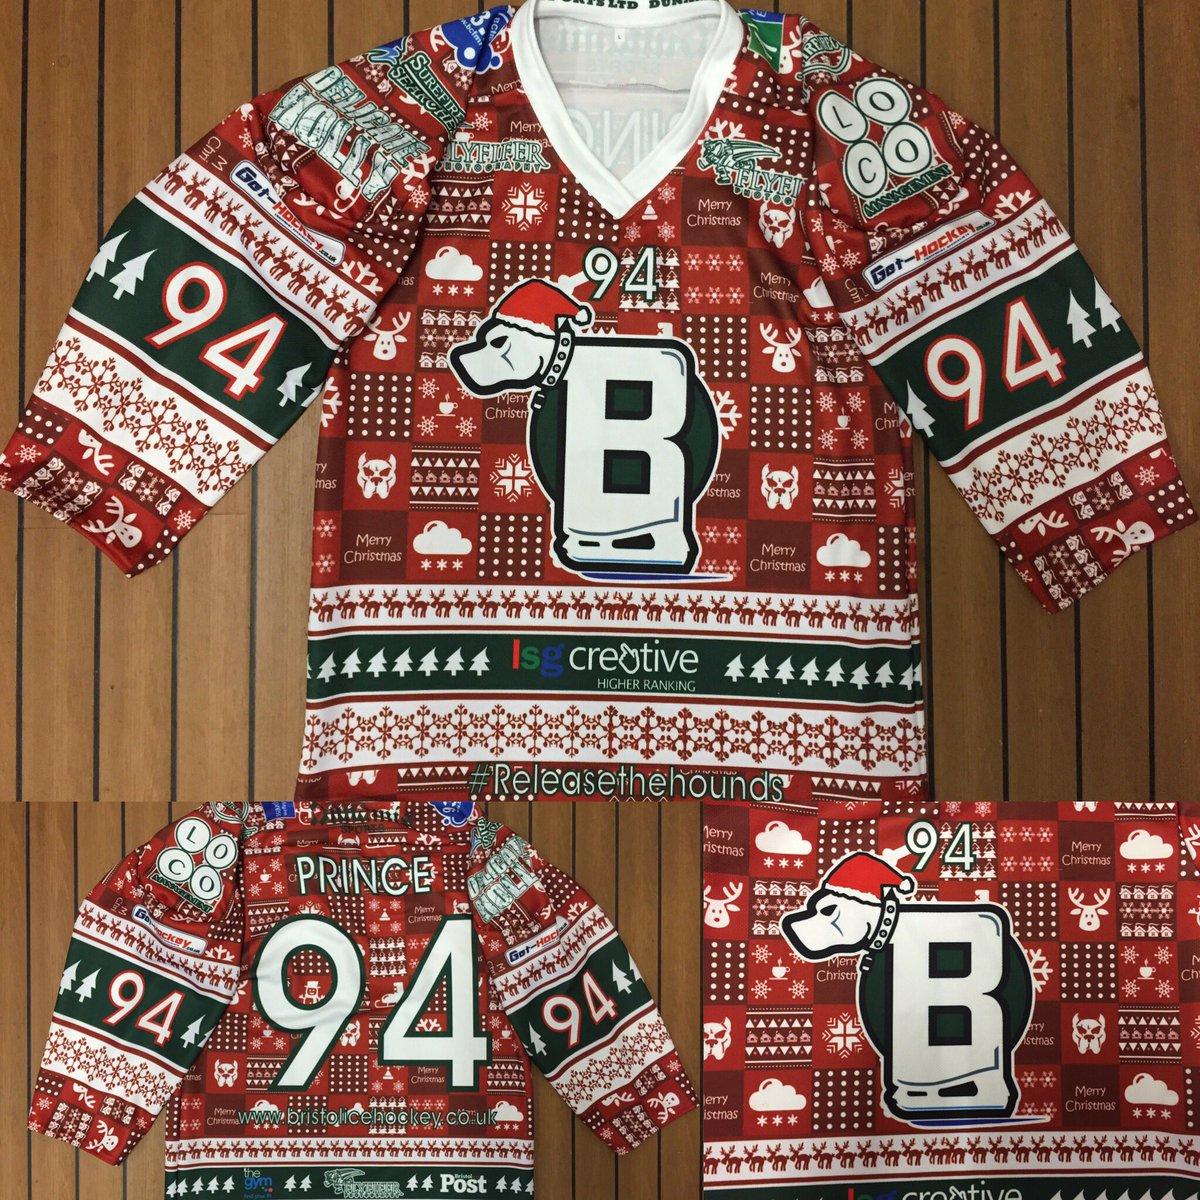 Design your own t-shirt bristol - Bristol Pitbulls Christmas Ice Hockey Shirt Perfect Design For This Festive Season Christmas Festiveseason Icehockeypic Twitter Com Fsiikh6vru